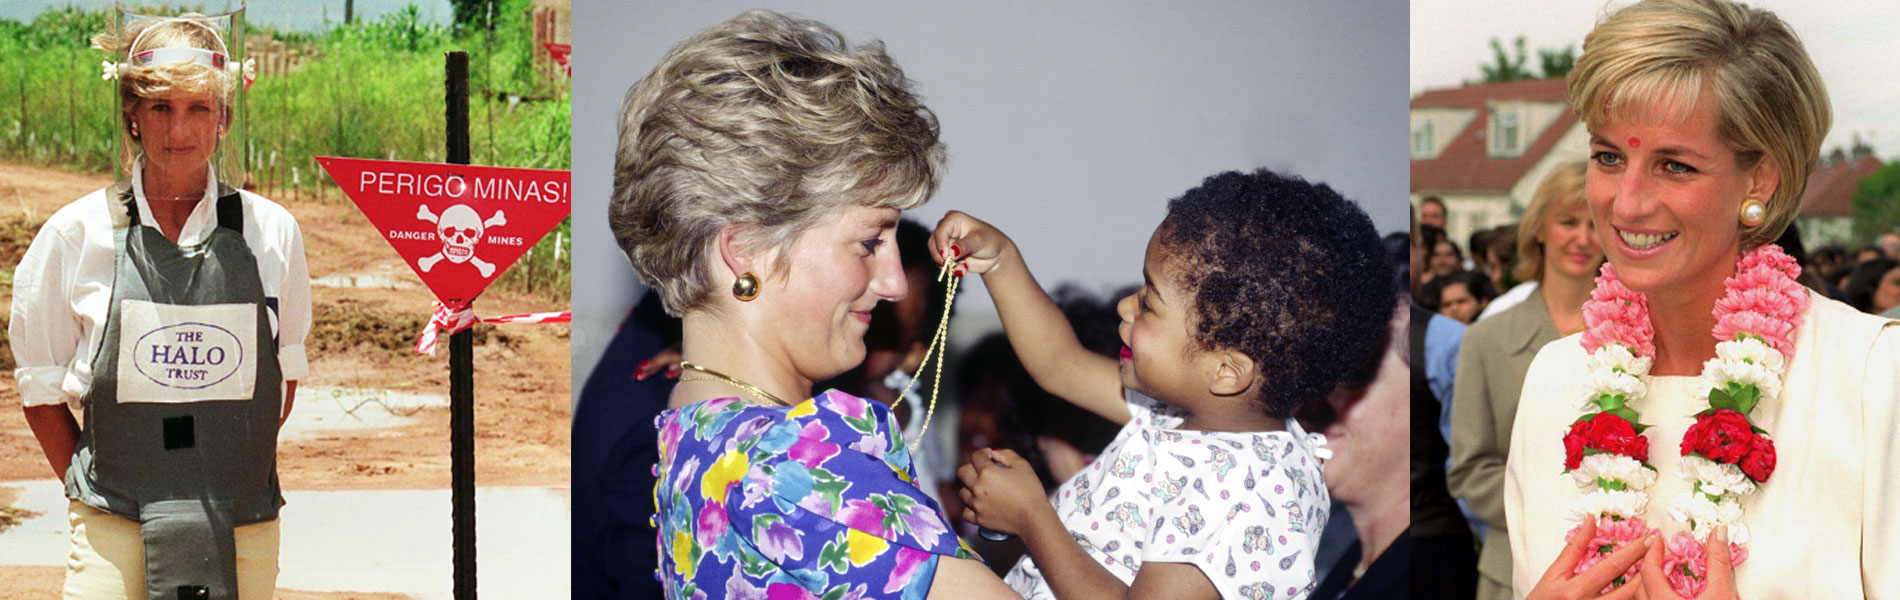 Diana de Gales, Reina de la Solidaridad